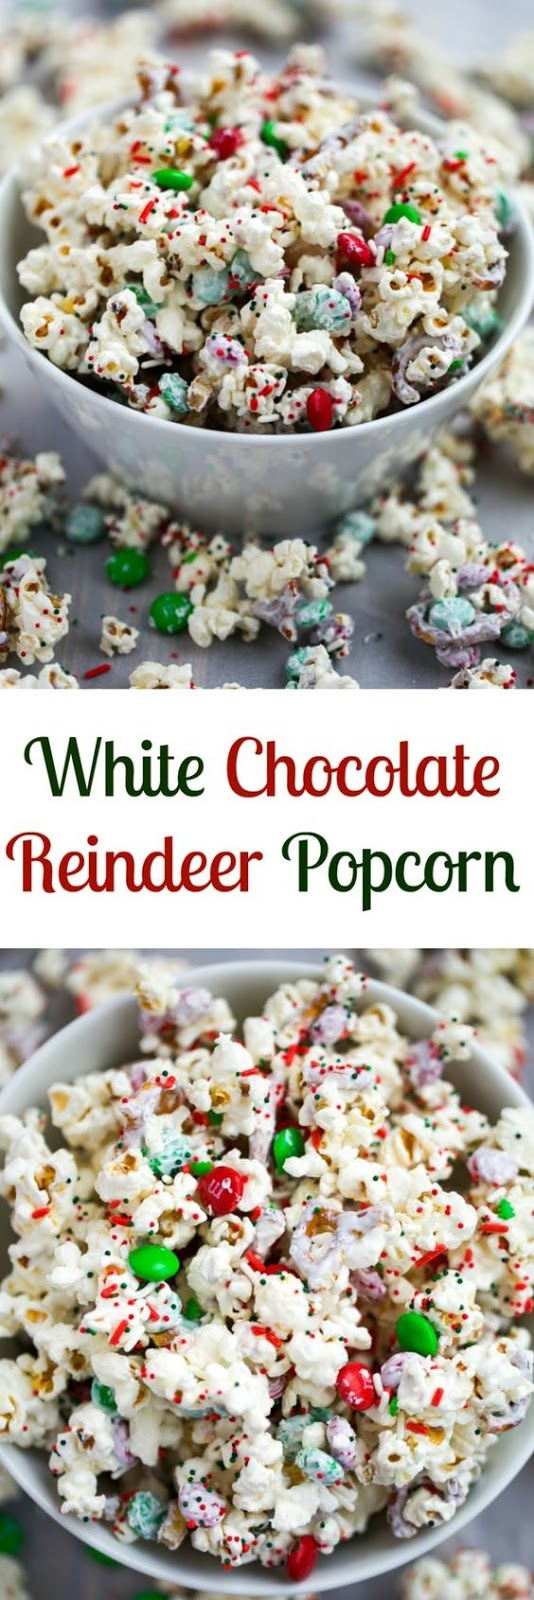 White Chocolate Reindeer Popcorn